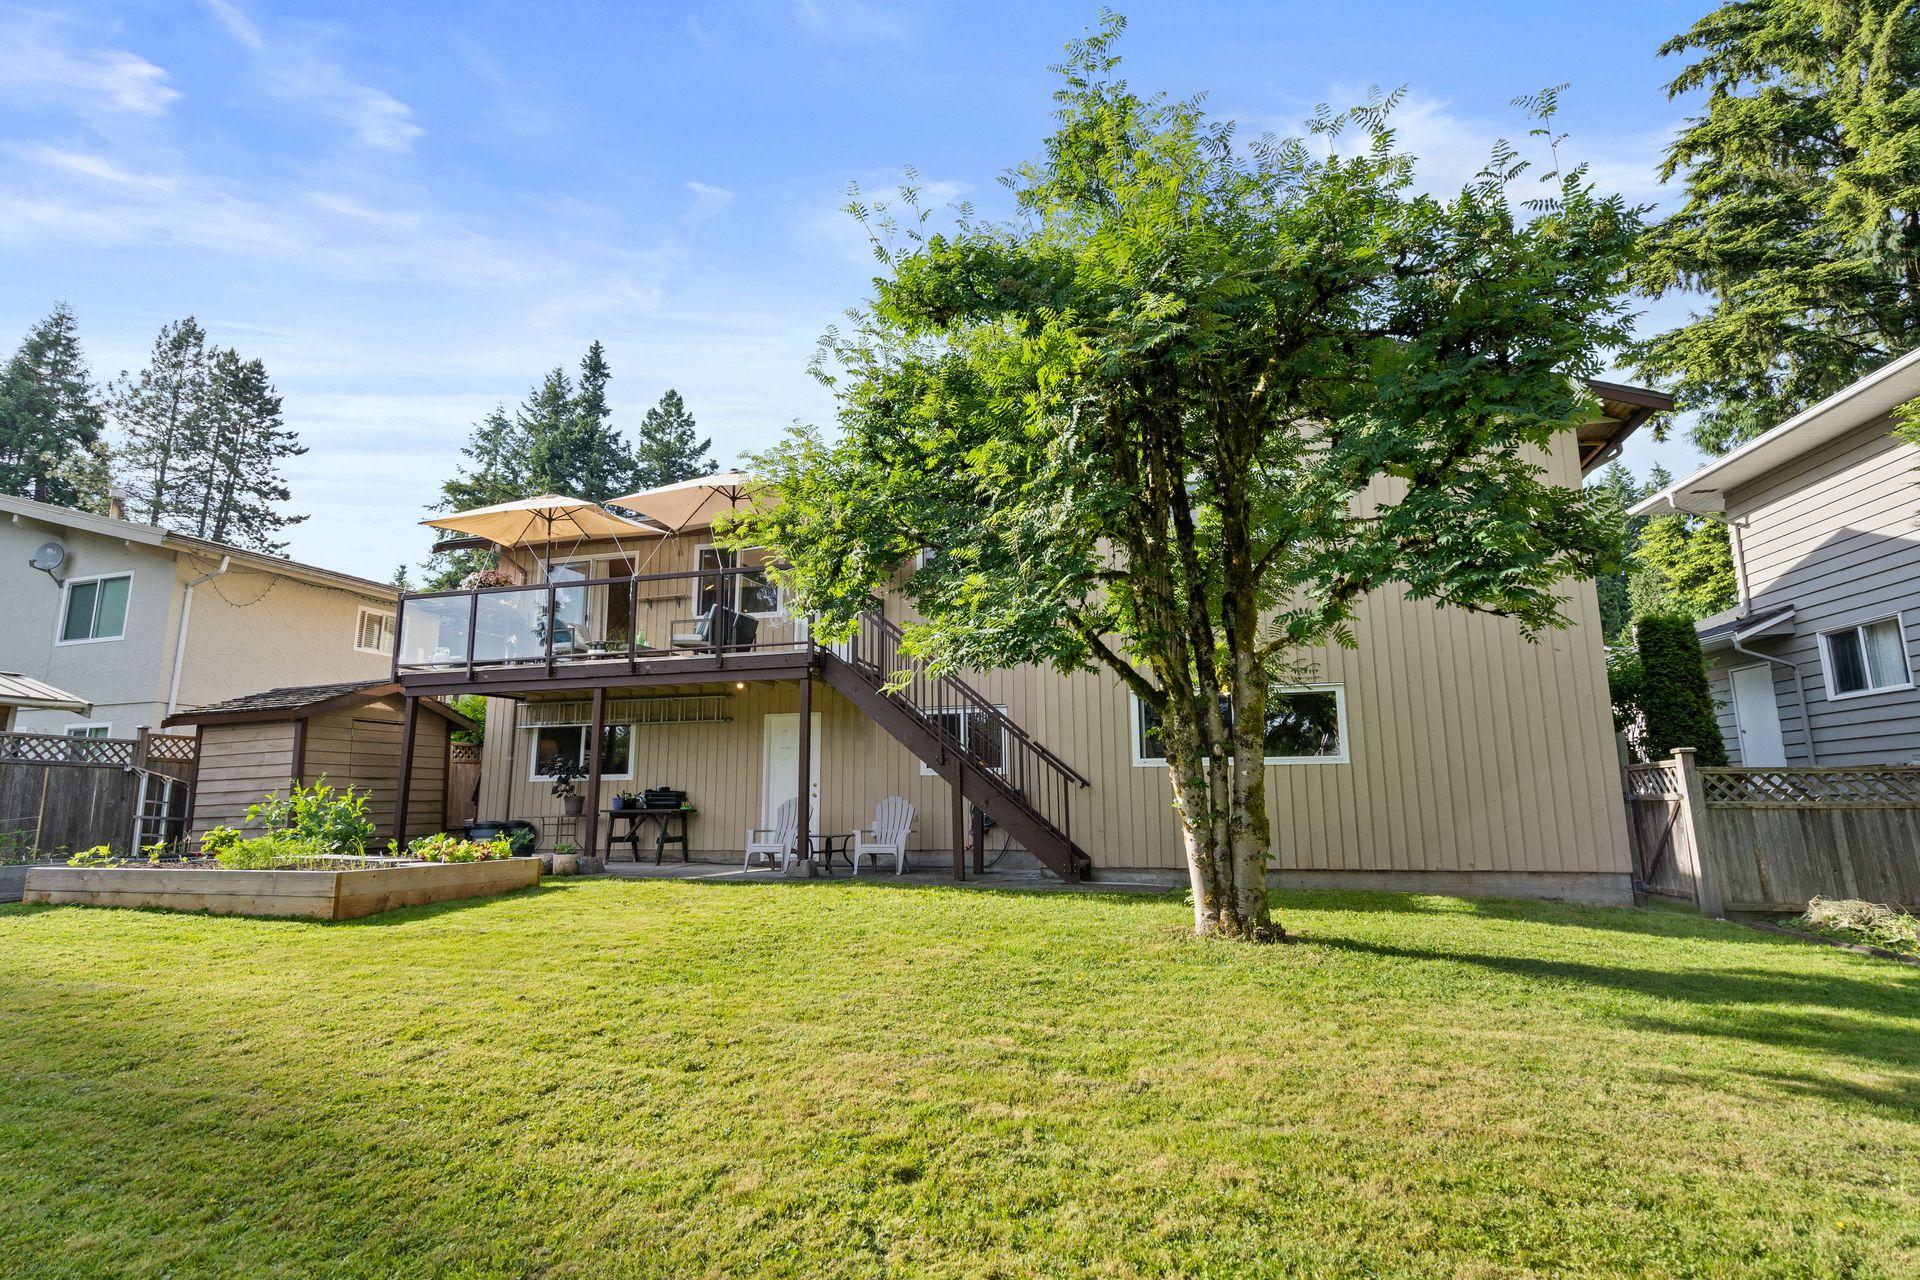 2673-byron-rd-north-vancouver-36 at 2673 Byron Road, Blueridge NV, North Vancouver